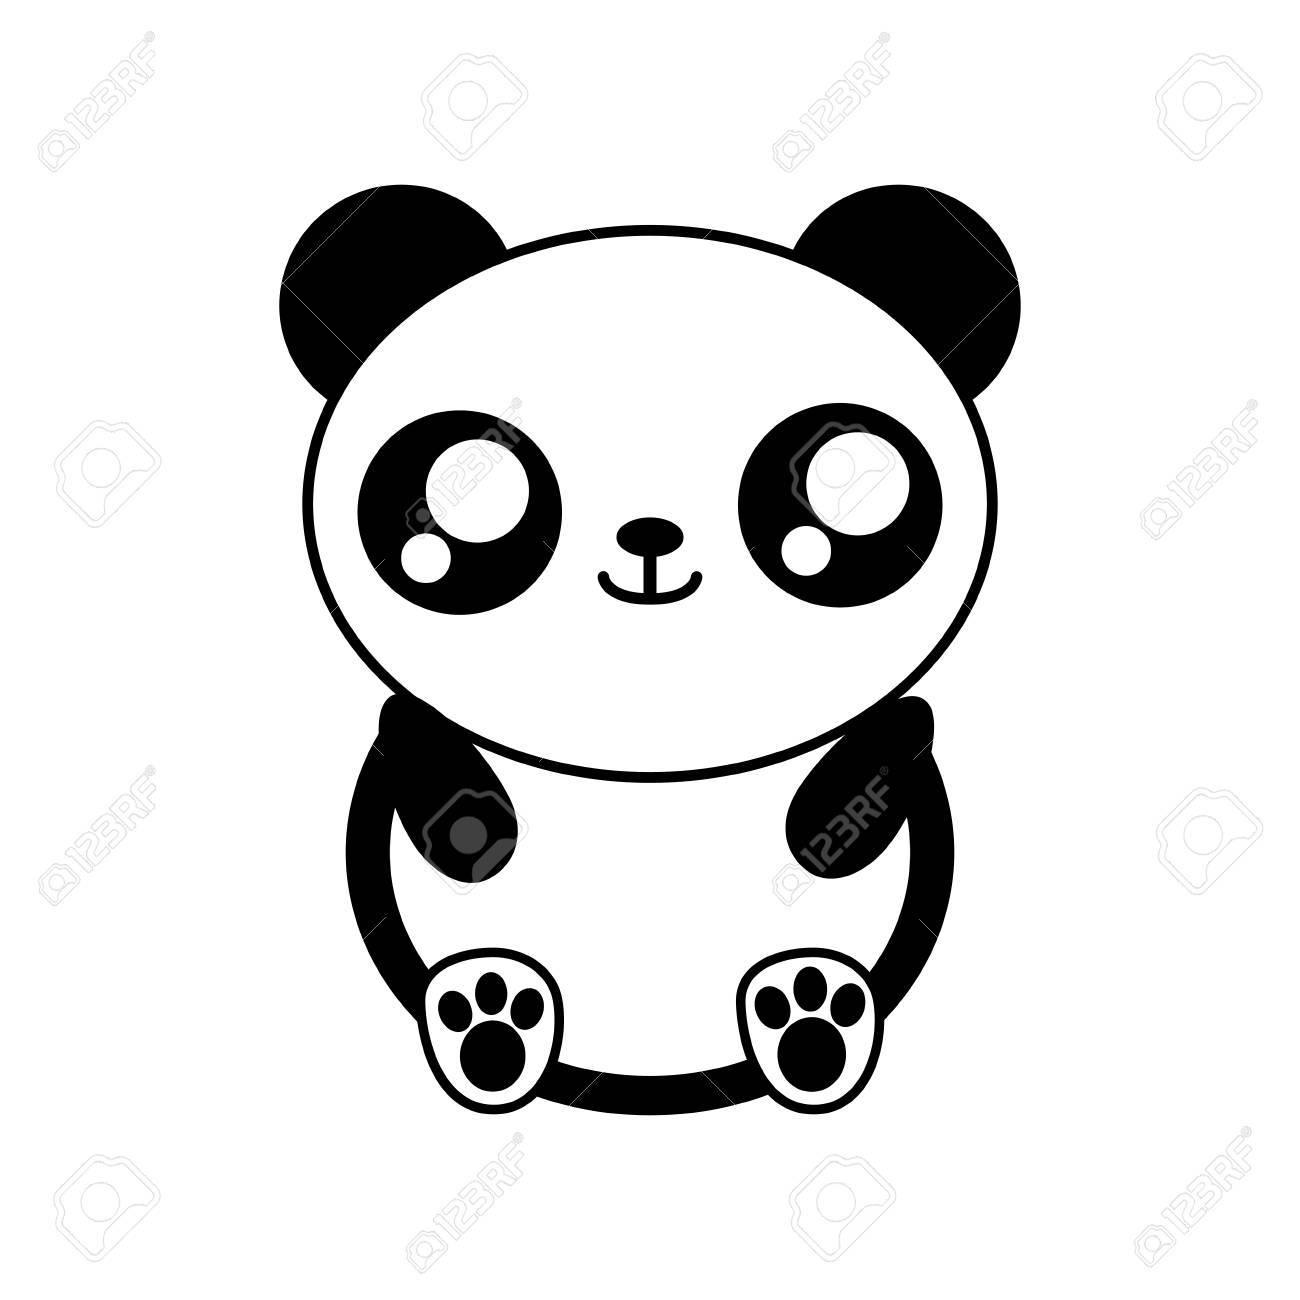 Ours Panda Kawaii Animal Mignon Petite Icône Isolé Et Plat Illustration